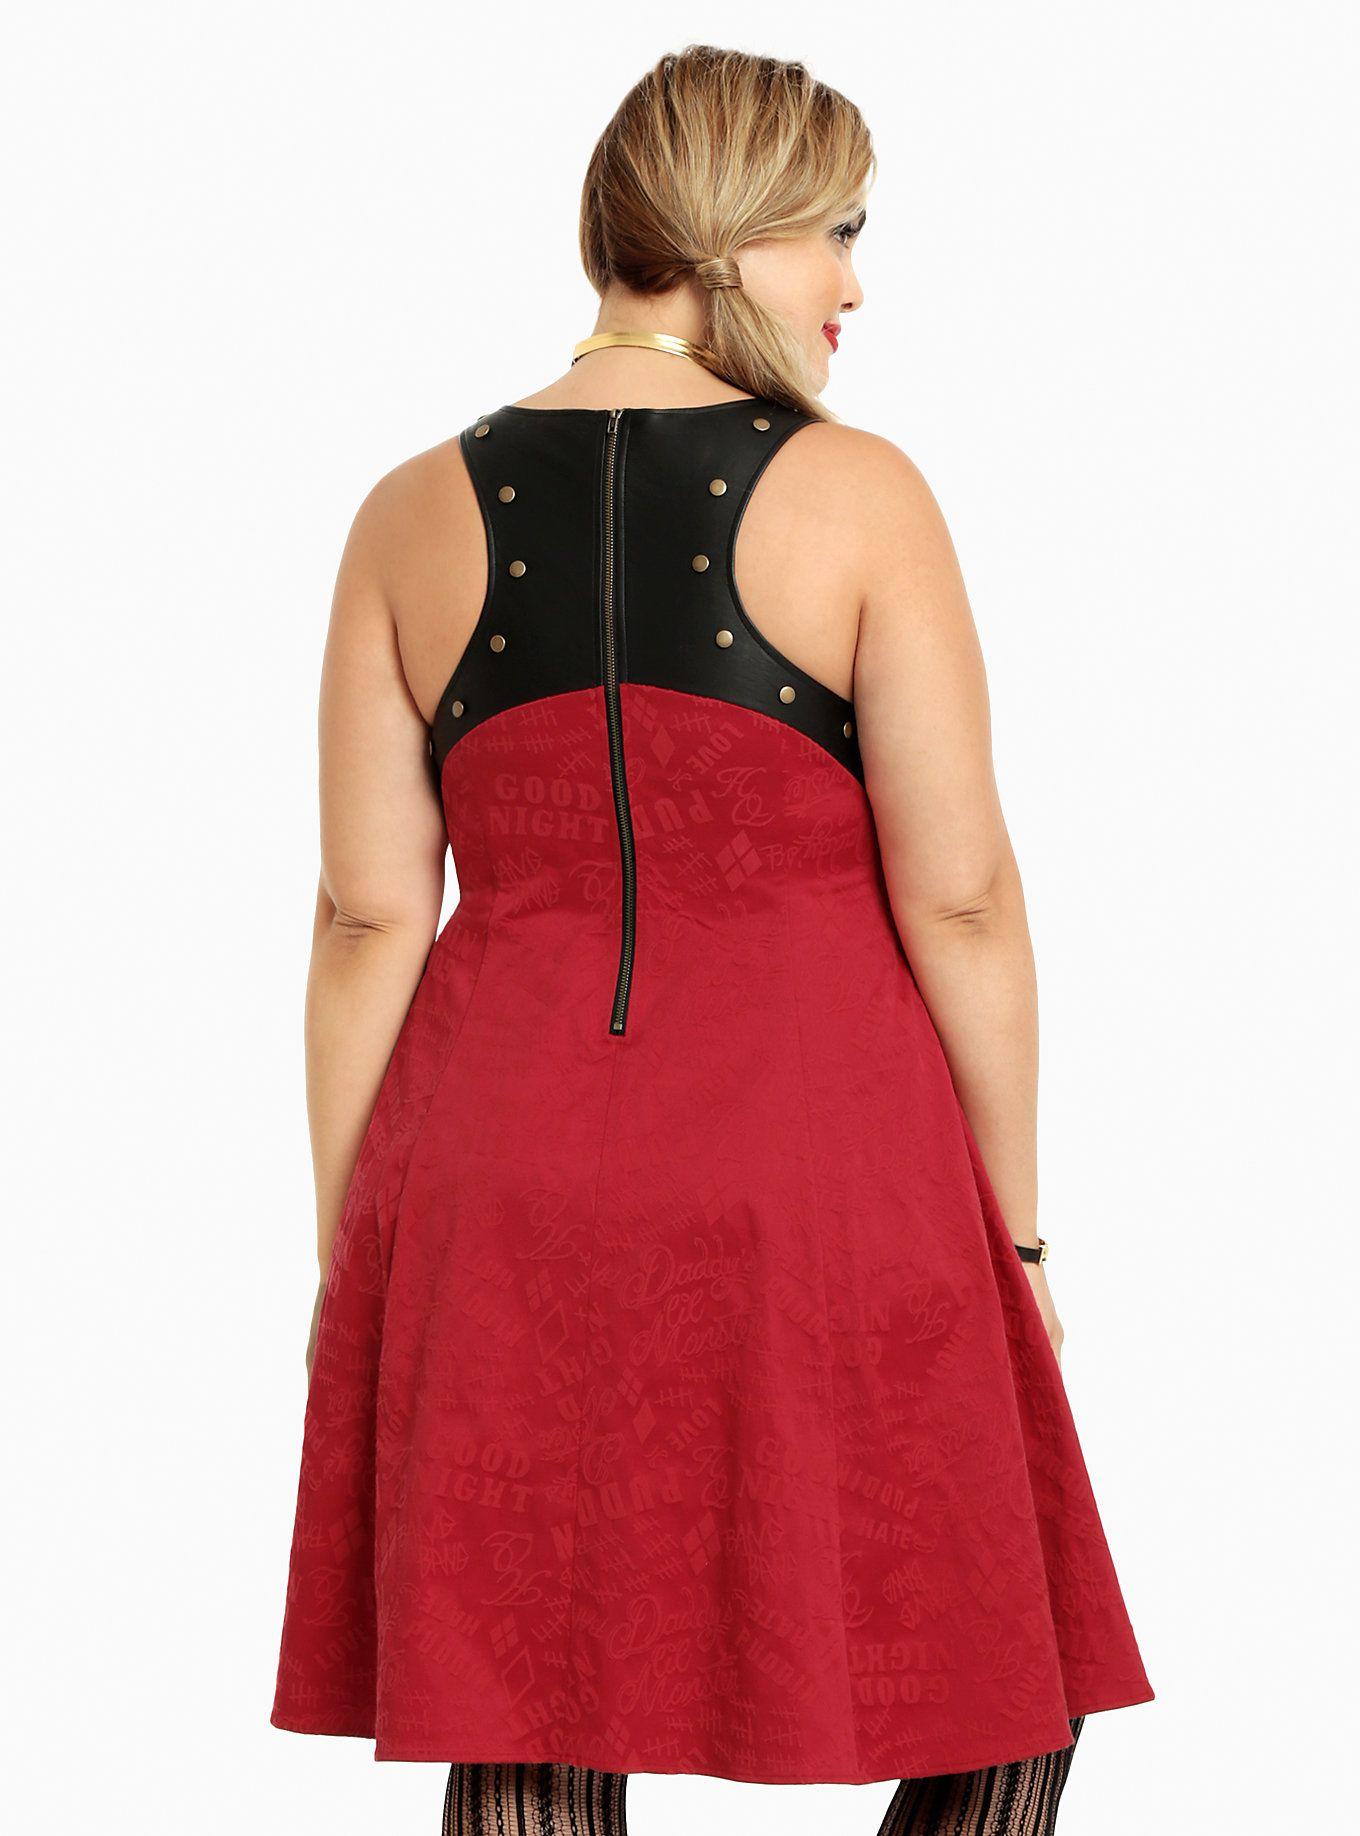 Dress size 24 torrid dress 24 torrid black and white draped v neck - Suicide Squad Collection Harley Quinn Holster Dress Torrid